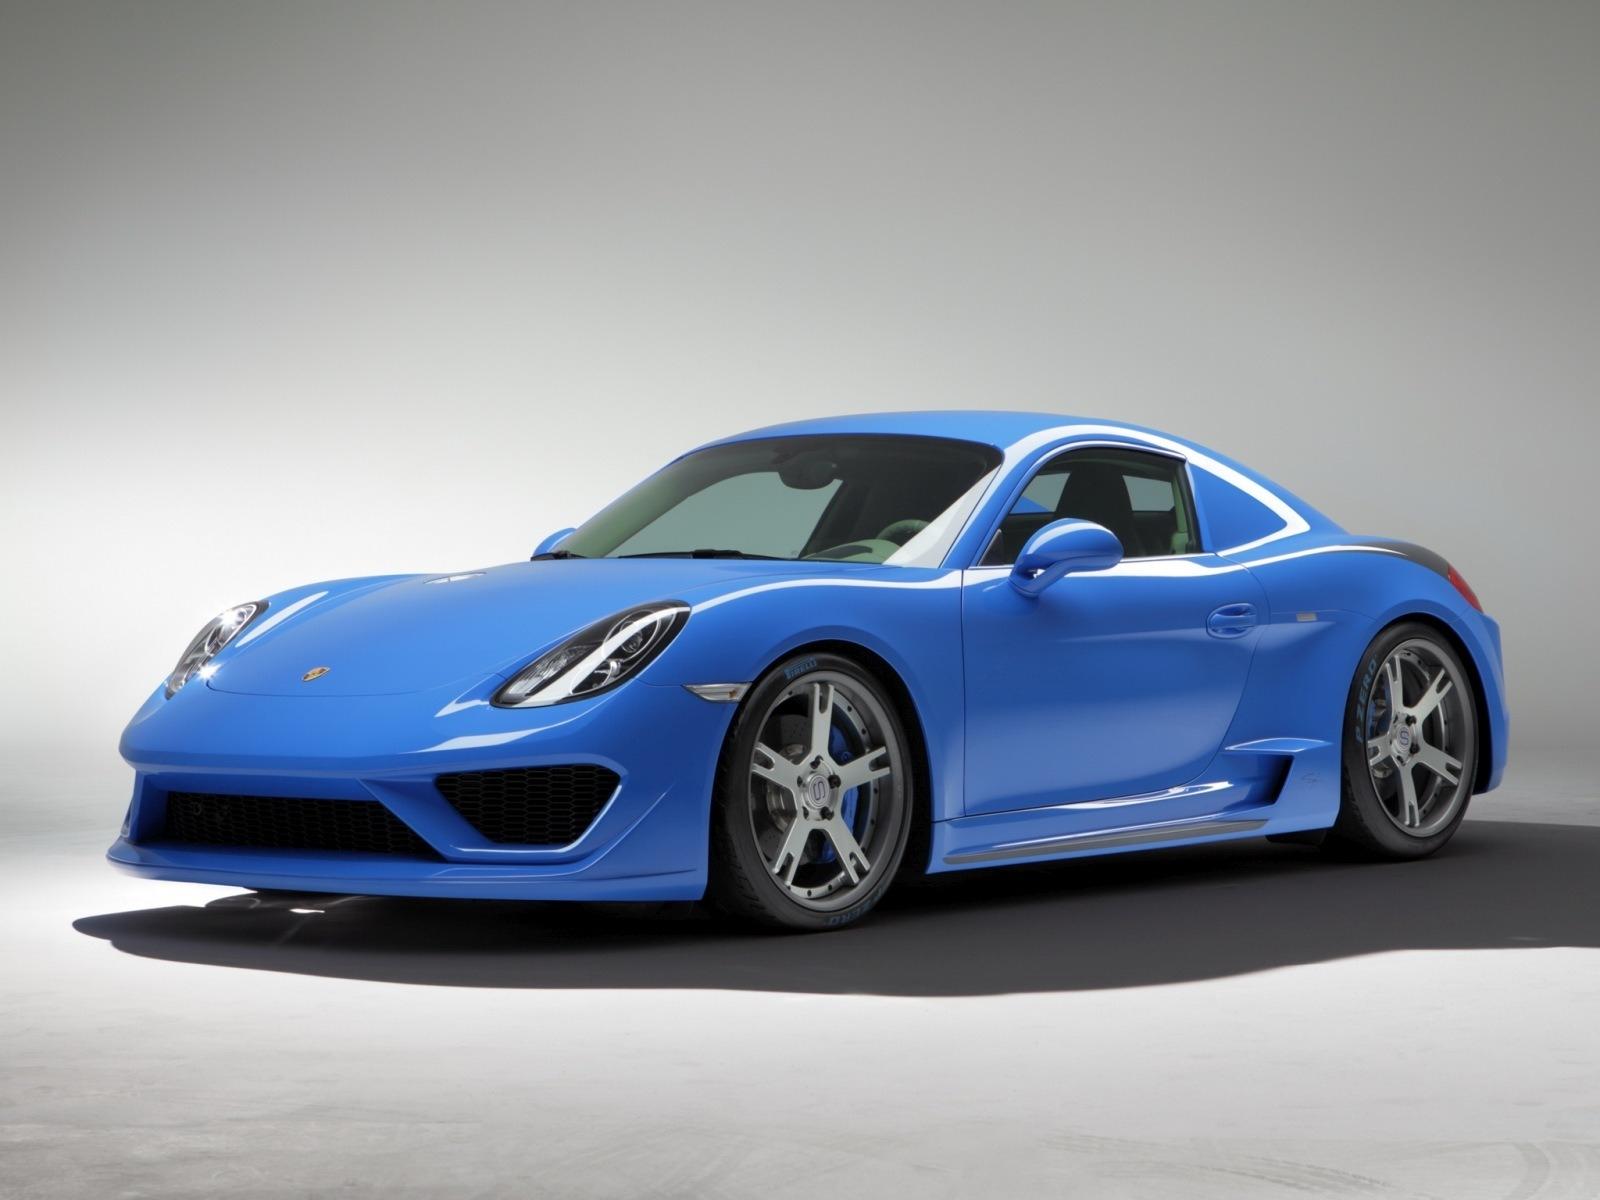 http://images.caradisiac.com/images/3/2/8/9/93289/S0-Studiotorino-Moncenisio-une-Porsche-Cayman-exclusive-317296.jpg